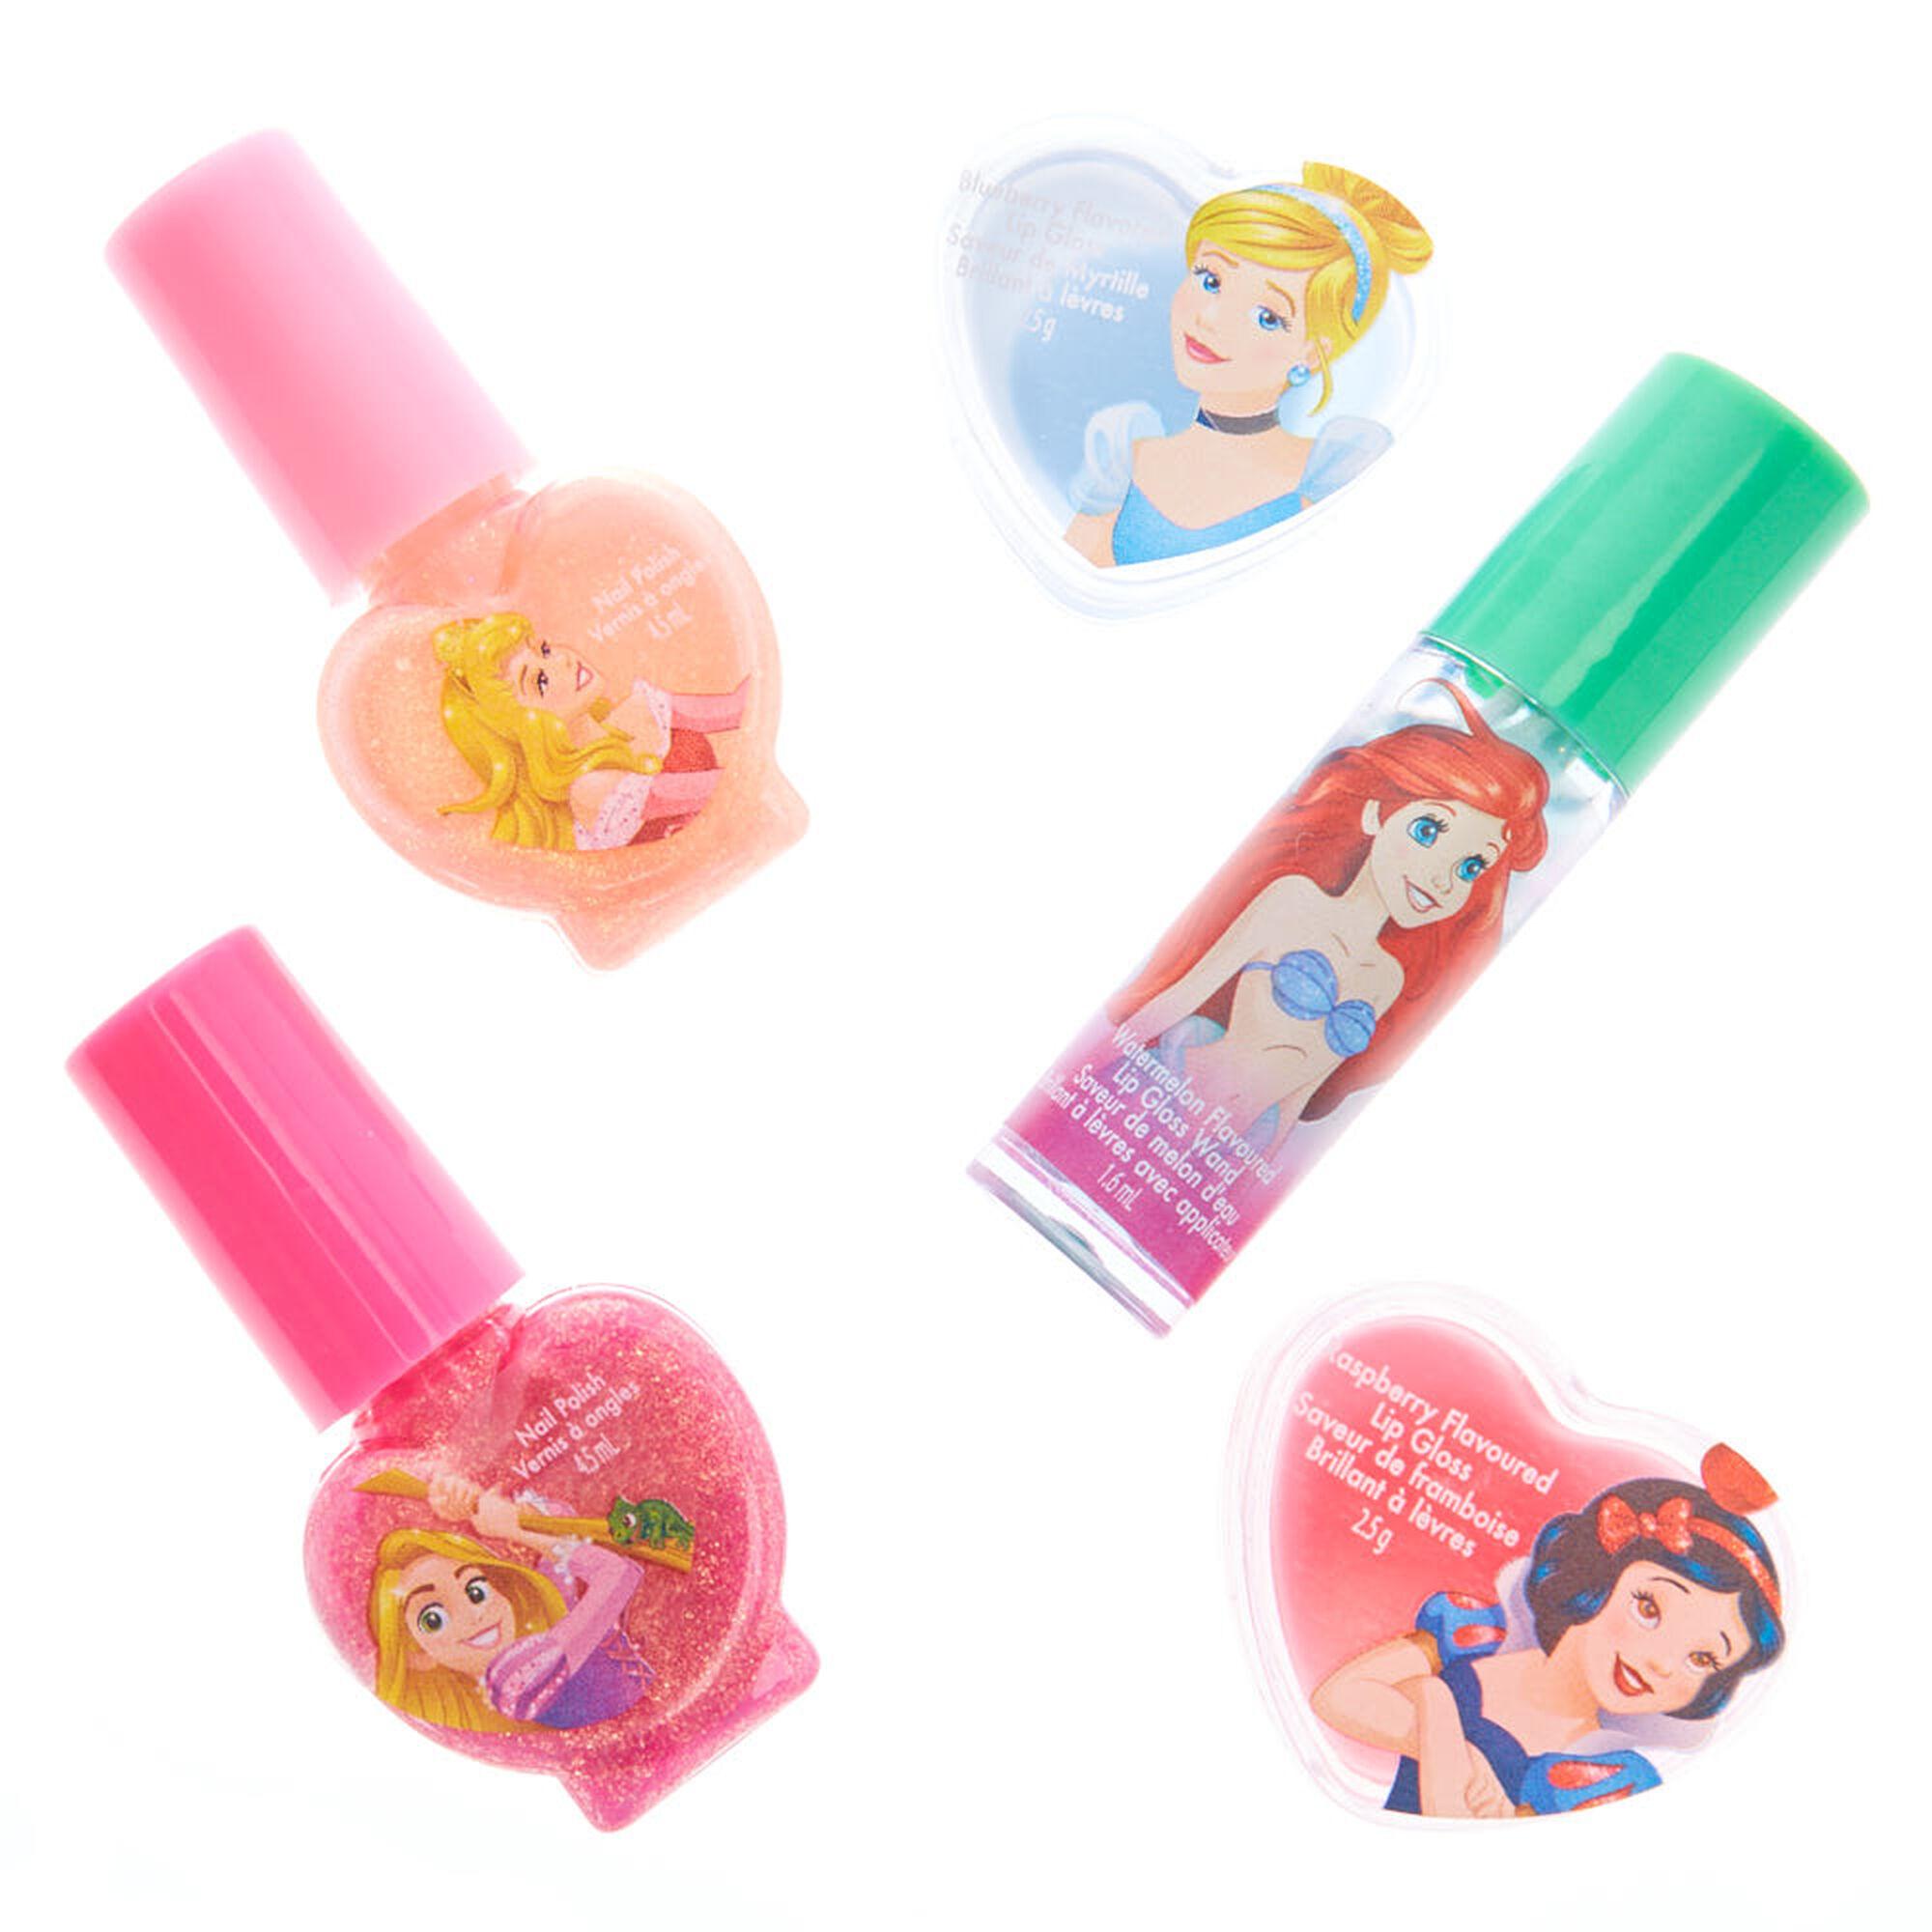 Disney Princess Makeup Set Australia | Wajihair co